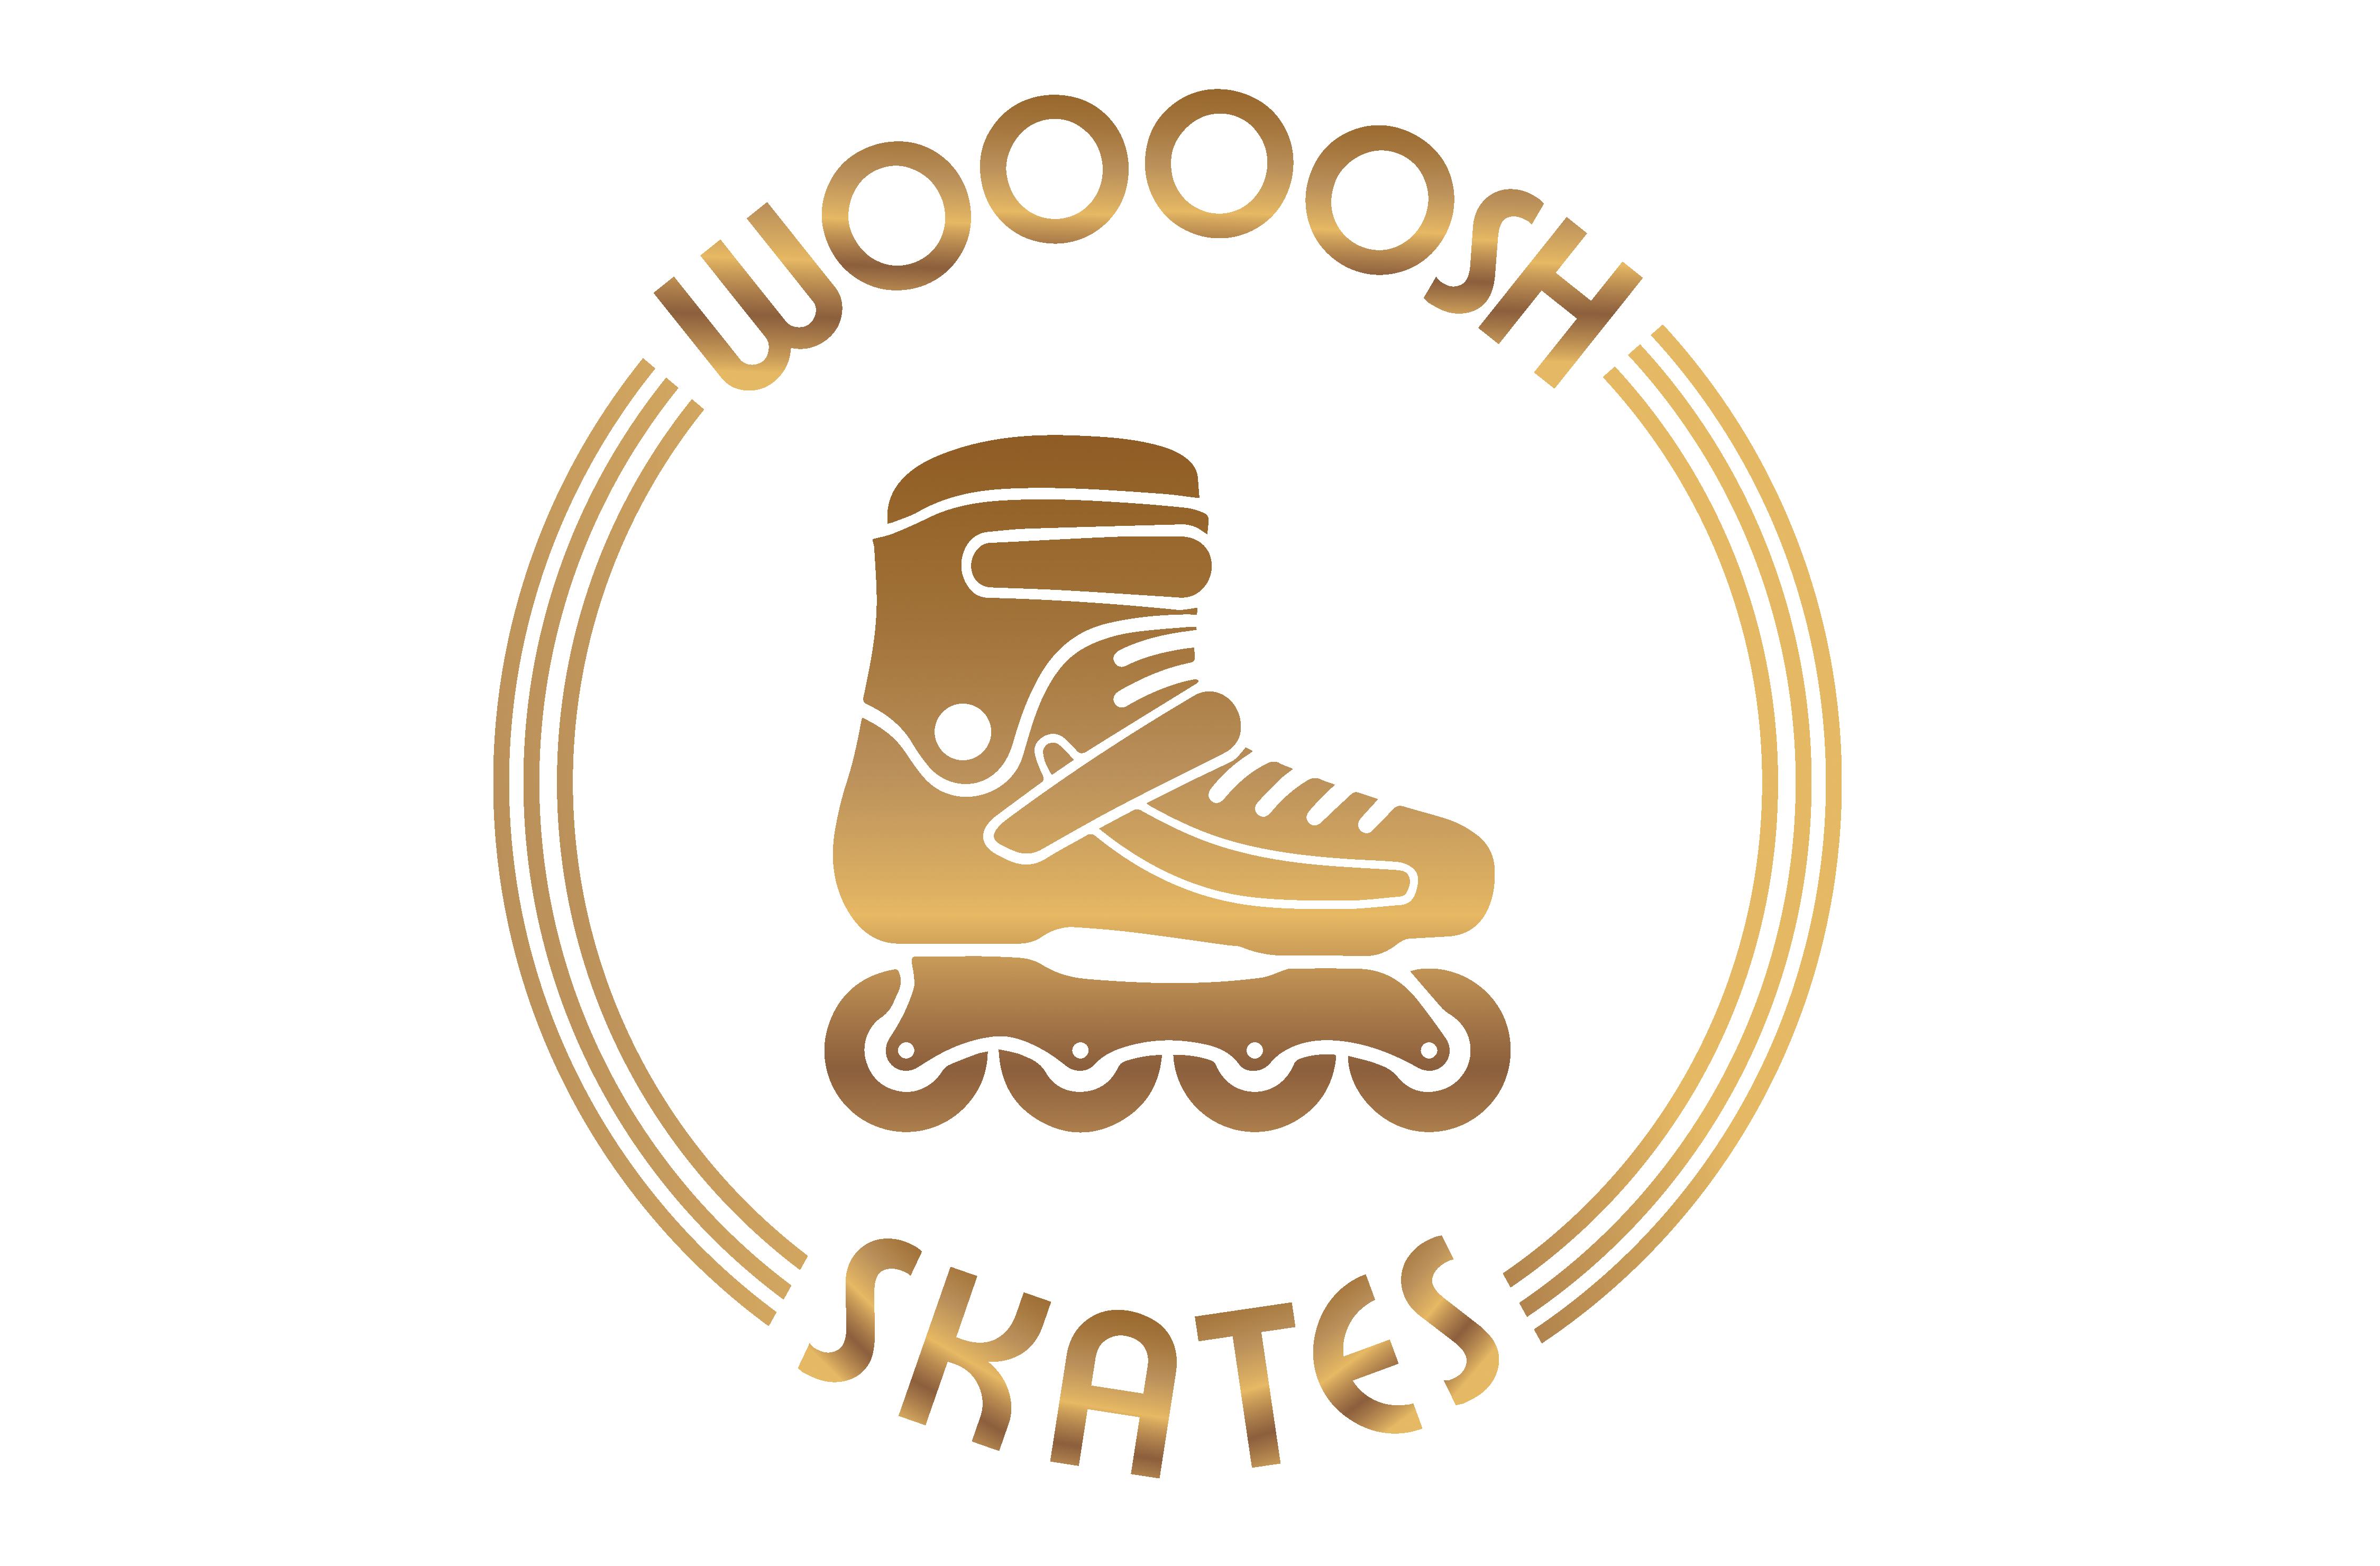 Woooosh Skates